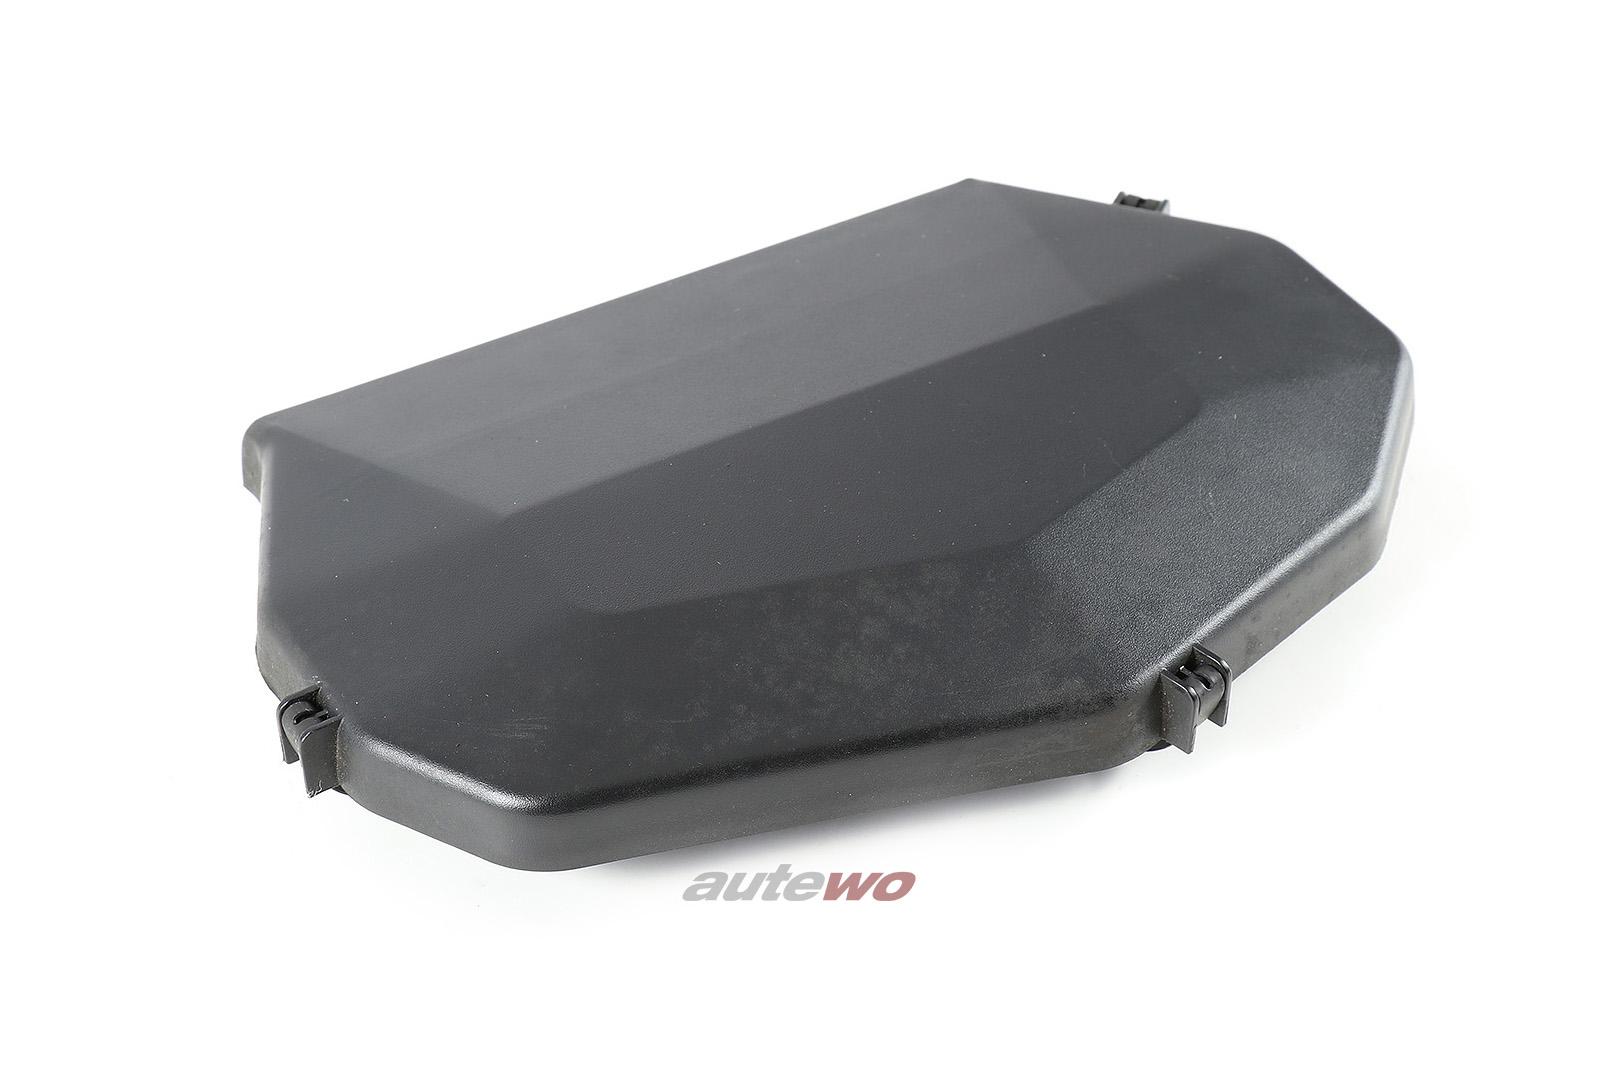 078109123Q NEU Audi/VW/Skoda A4 B5/A6 C4/4B/A8 D2 V6 Zahnriemenschutz